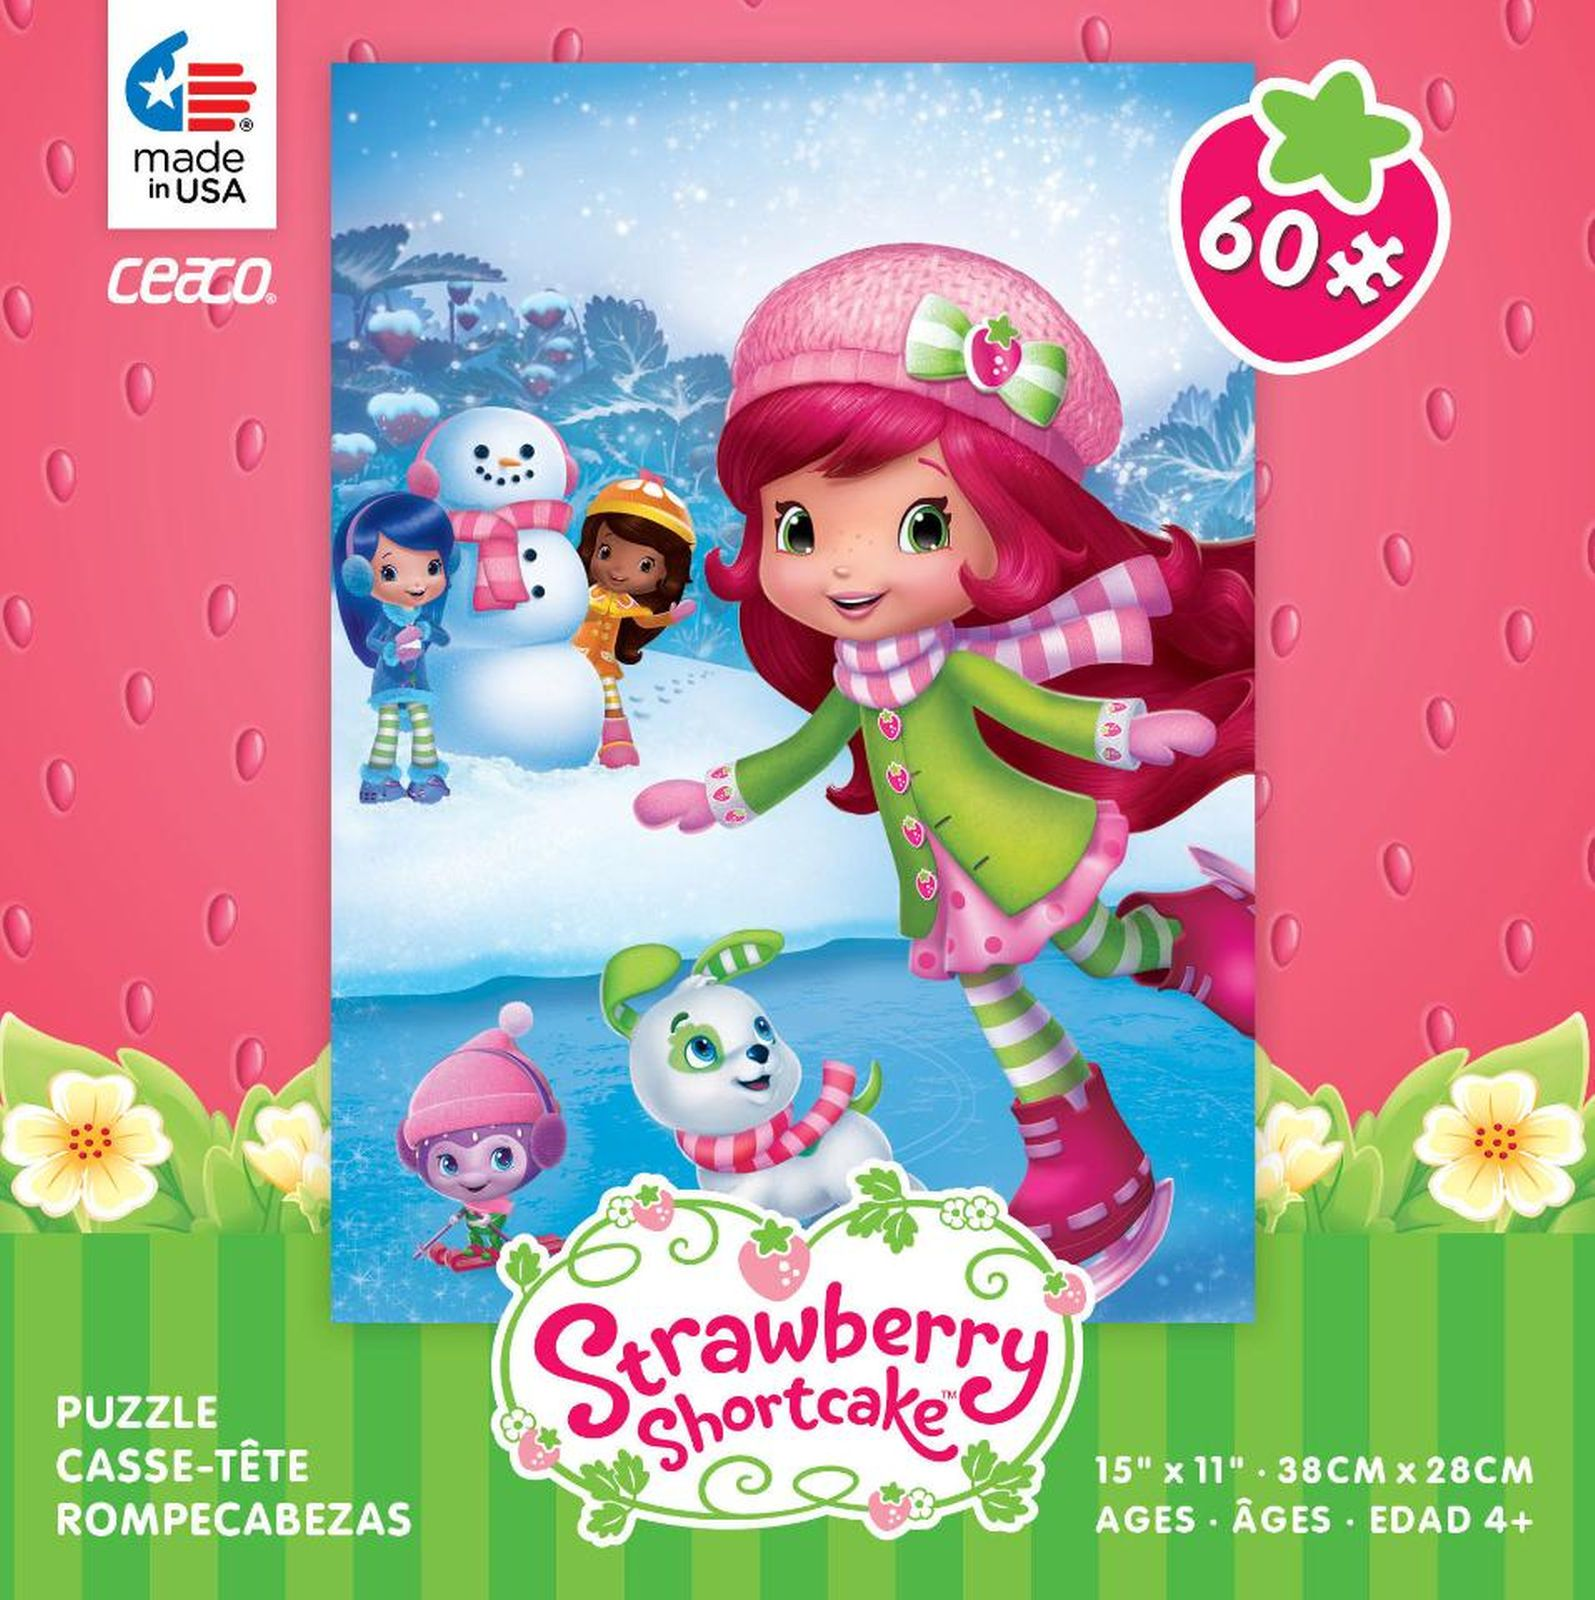 Ceaco Strawberry Shortcake Jigsaw Puzzle 60-Piece - Ice Skating